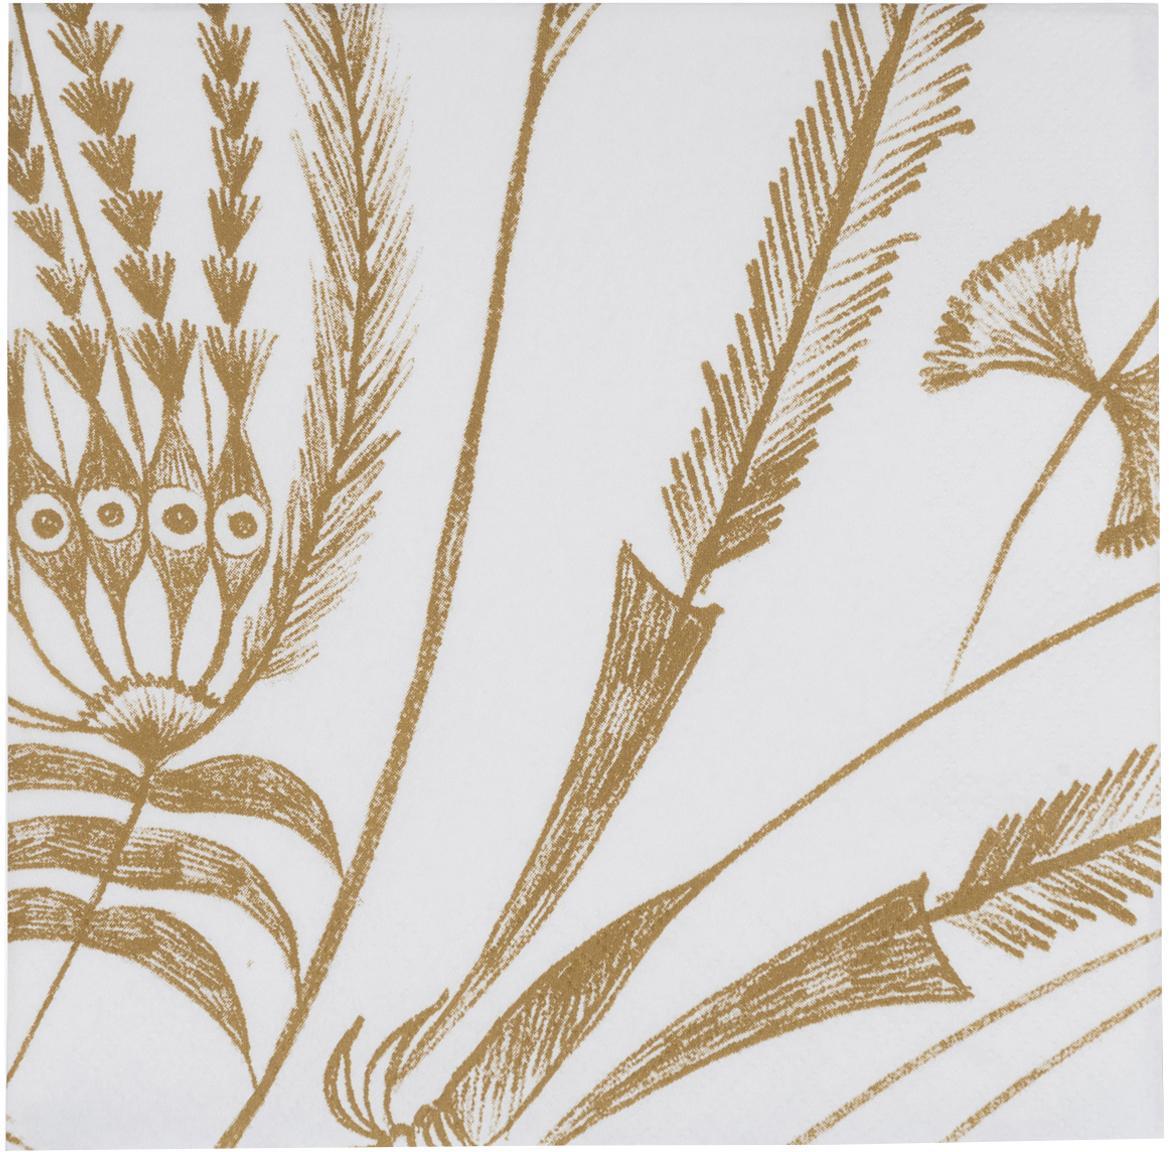 Tovagliolo di carta Bukit Jambul 12 pz, Carta, Bianco, marrone, Larg. 33 x Lung. 33 cm